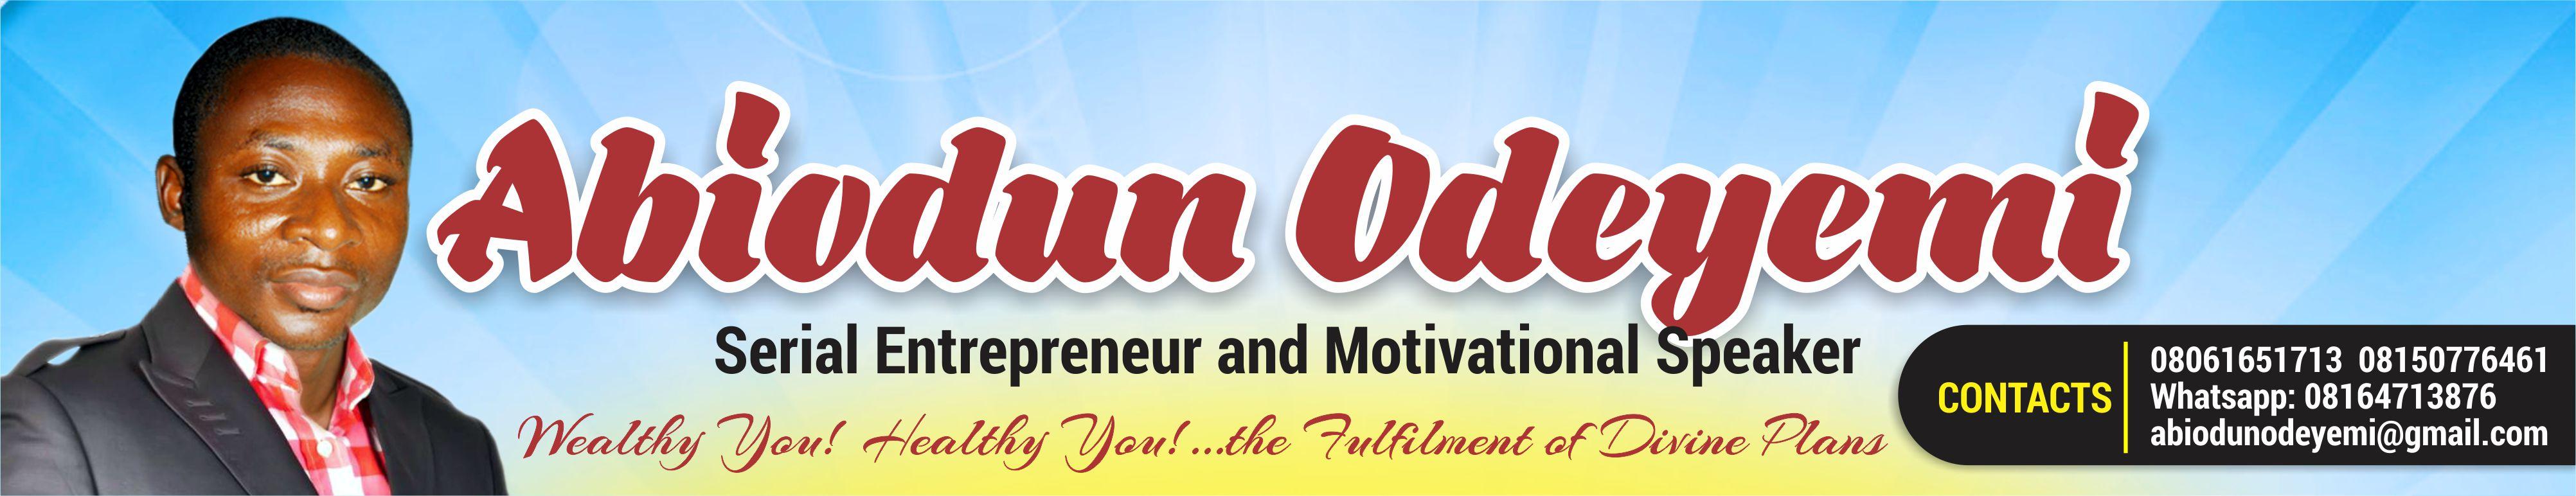 Abiodun Odeyemi web head banner